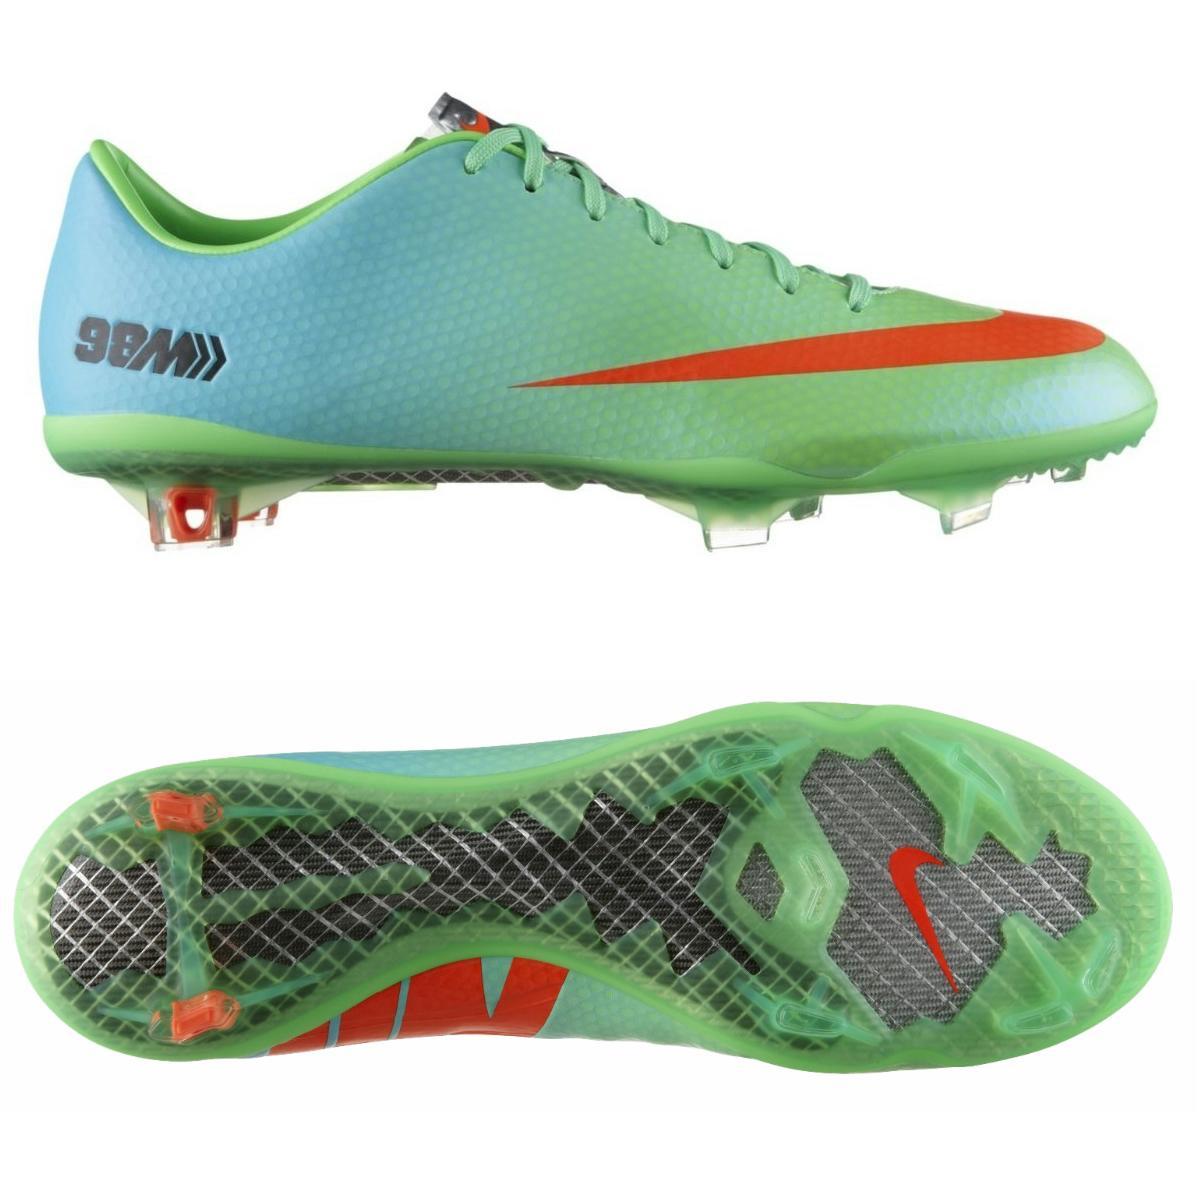 Nike Mercurial Vapor IX FG Fußballschuhe | eBay